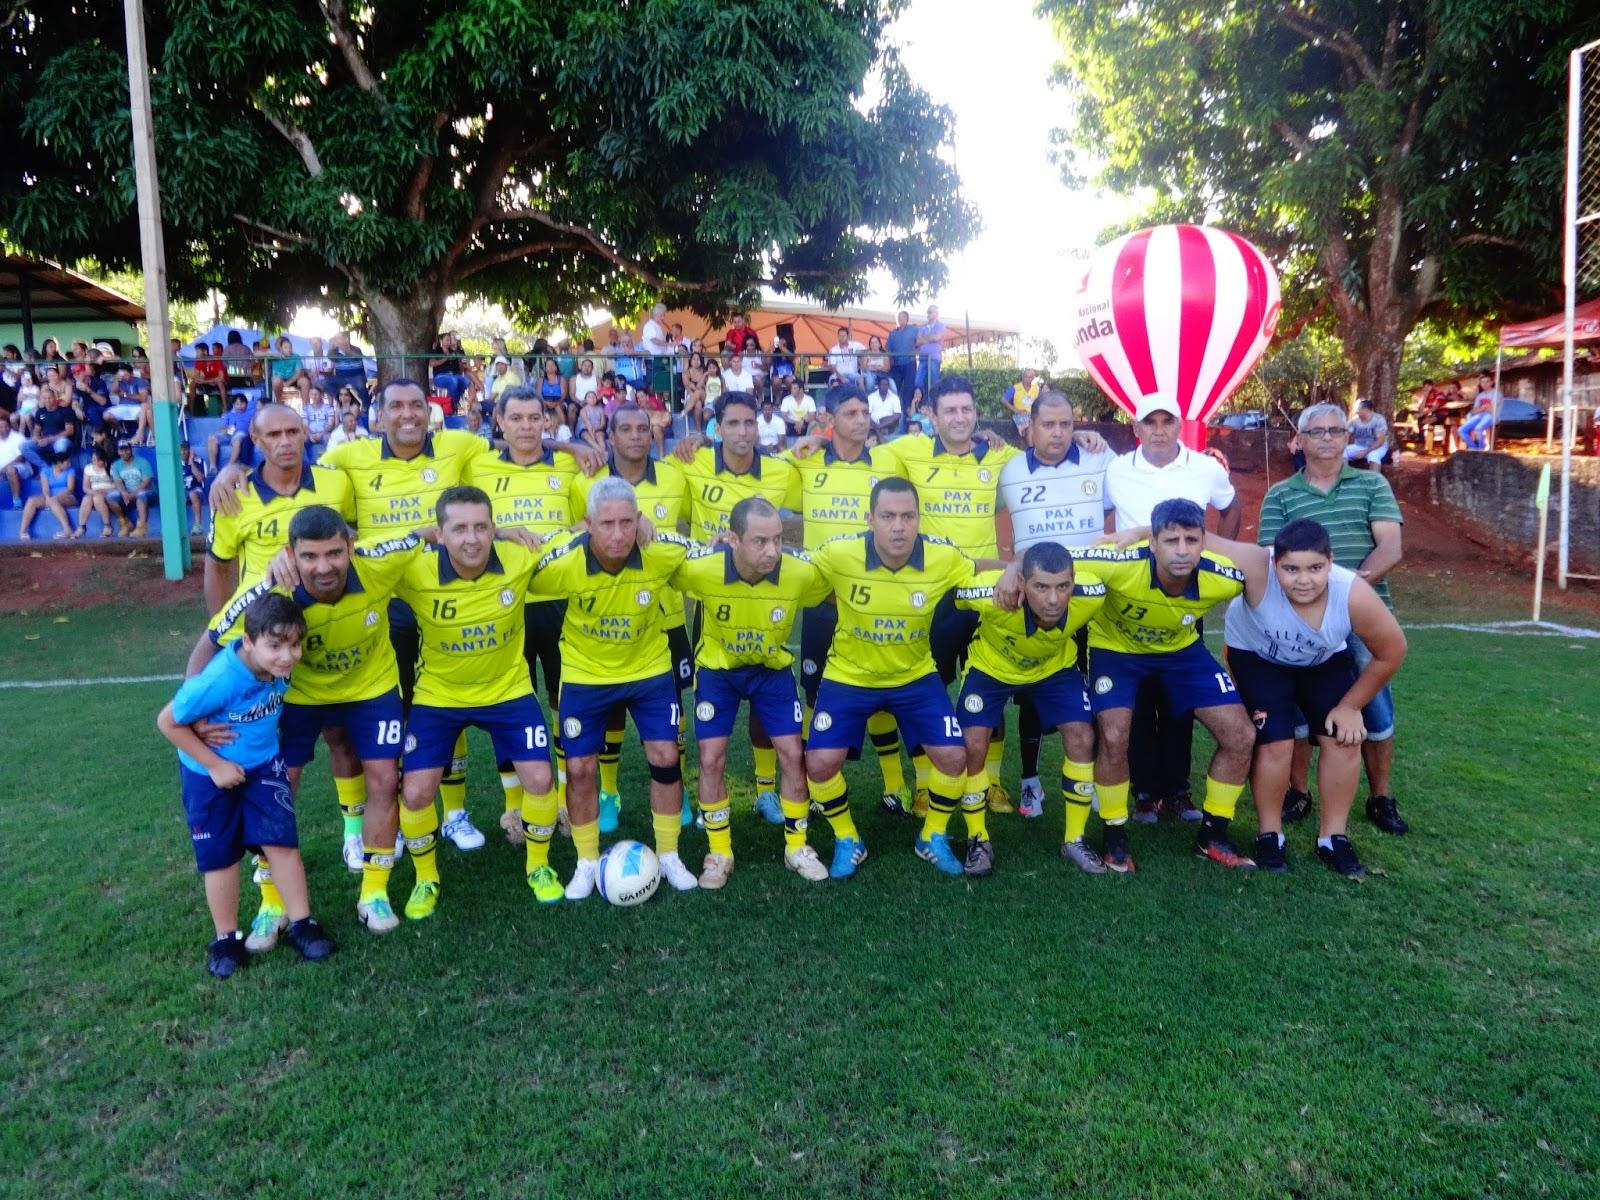 Jataí Esportes  Sub 100 Lago Azul vence Sindjatai Pax Santa Fé e ... eda4ea247df7d